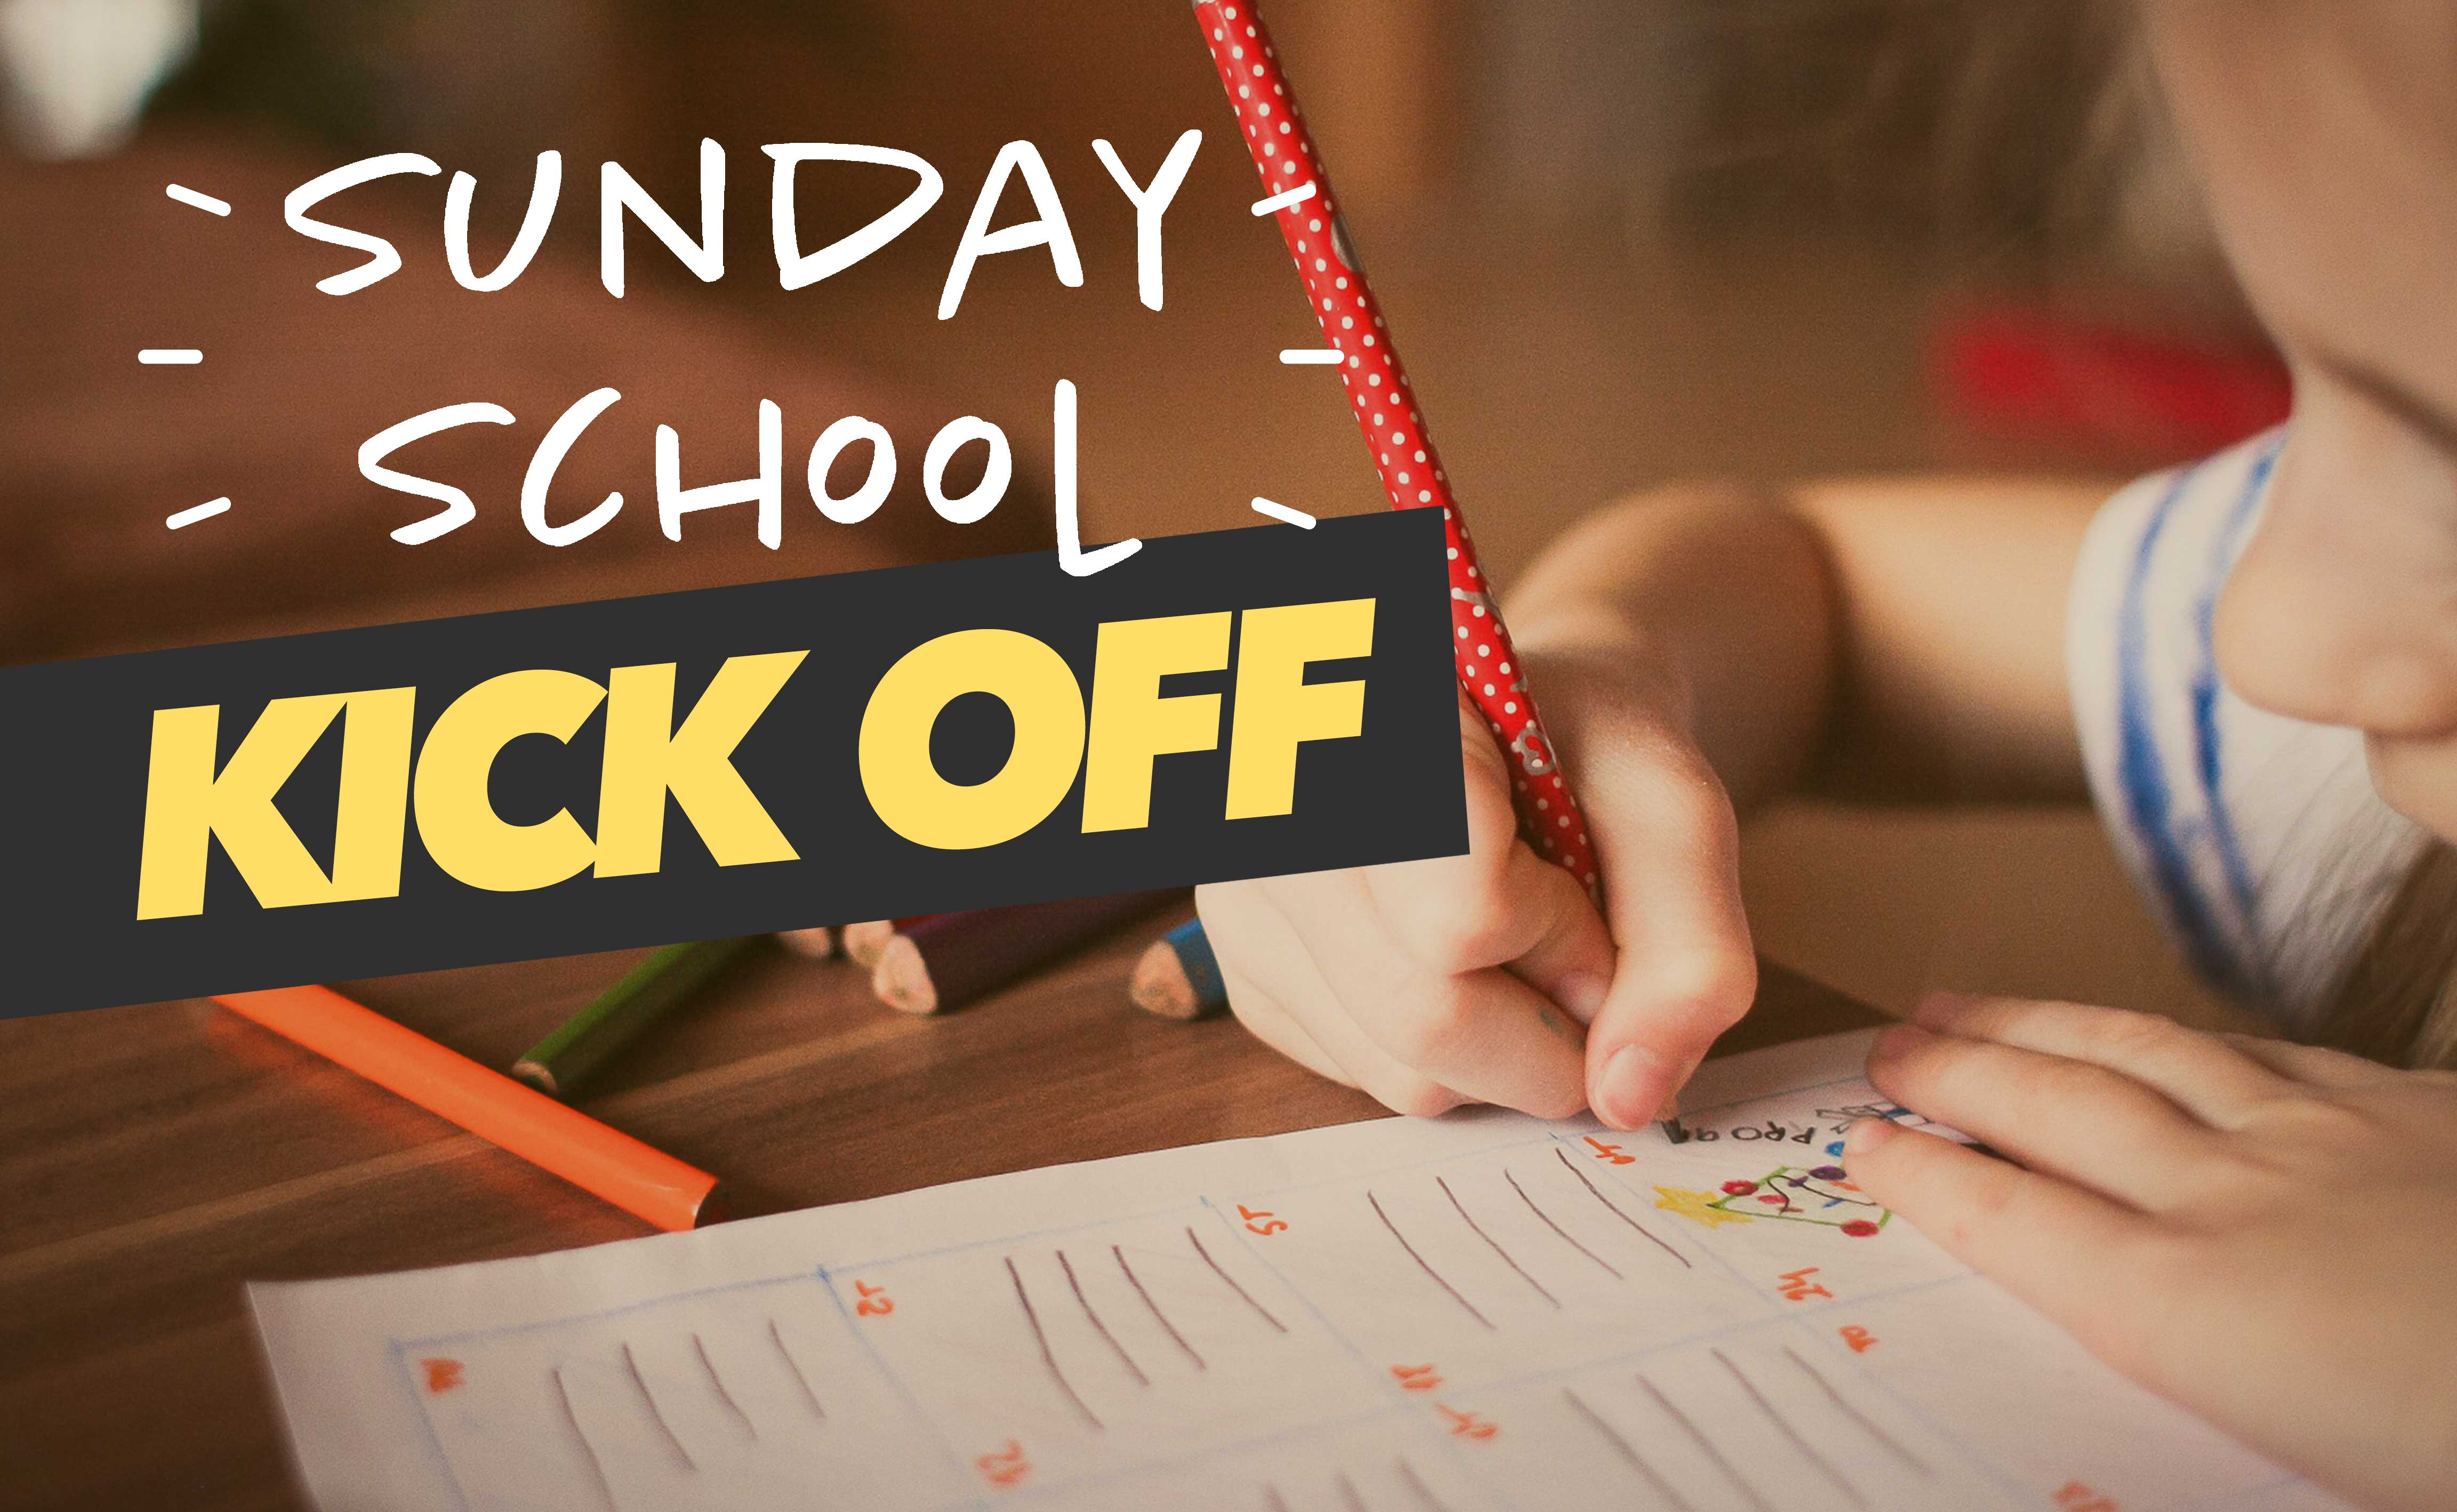 Child Writing in Sunday School